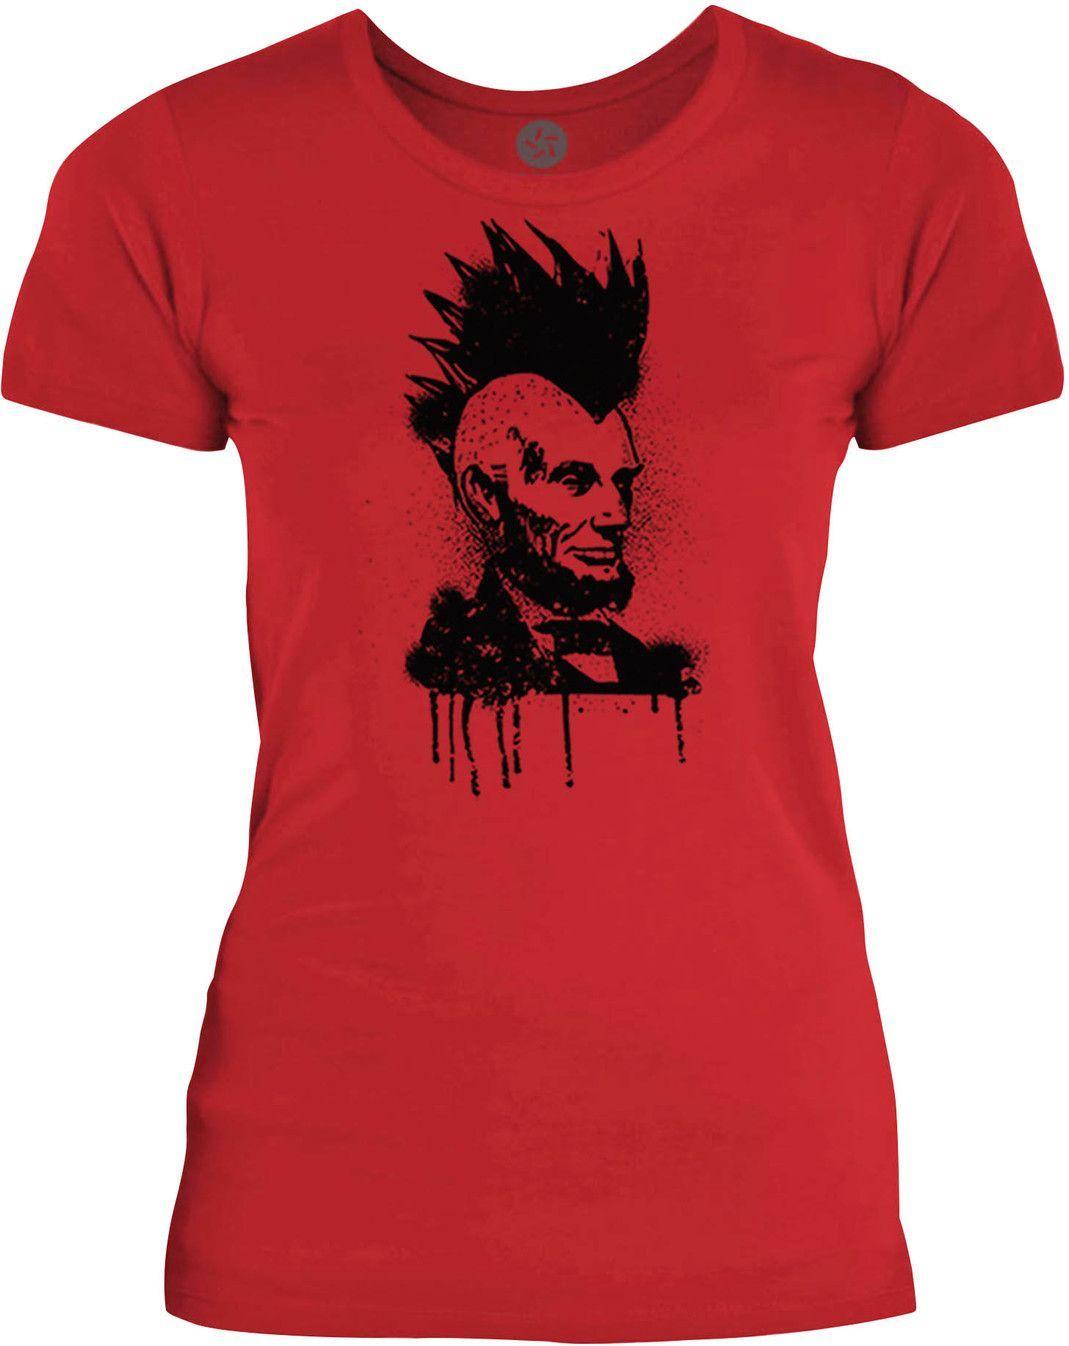 Big texas mohawk lincoln black womens fine jersey tshirt